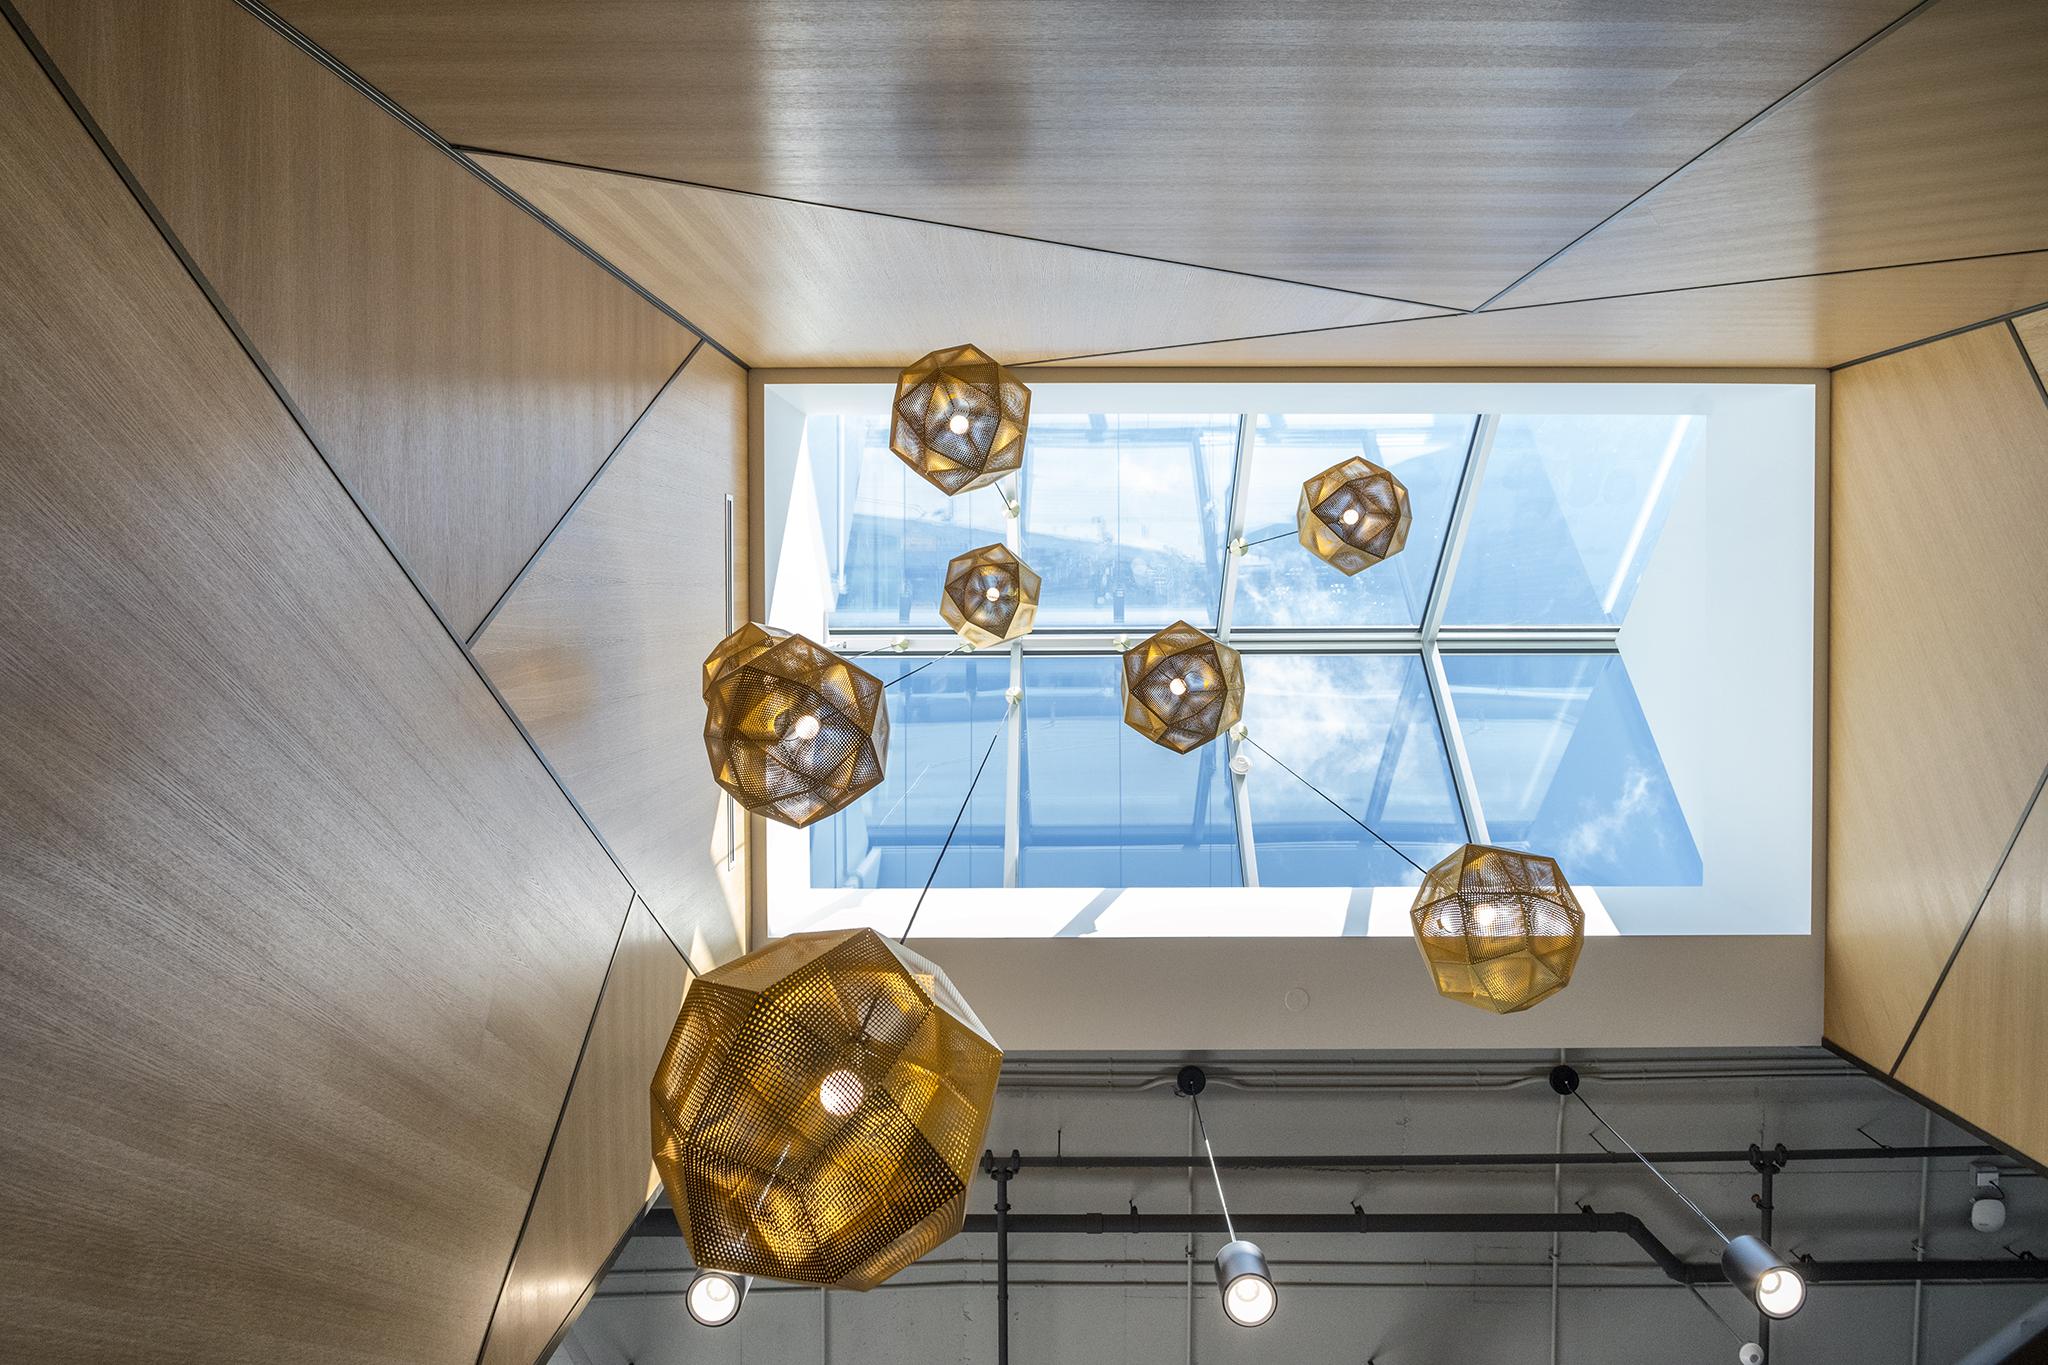 TDS skylight with lights